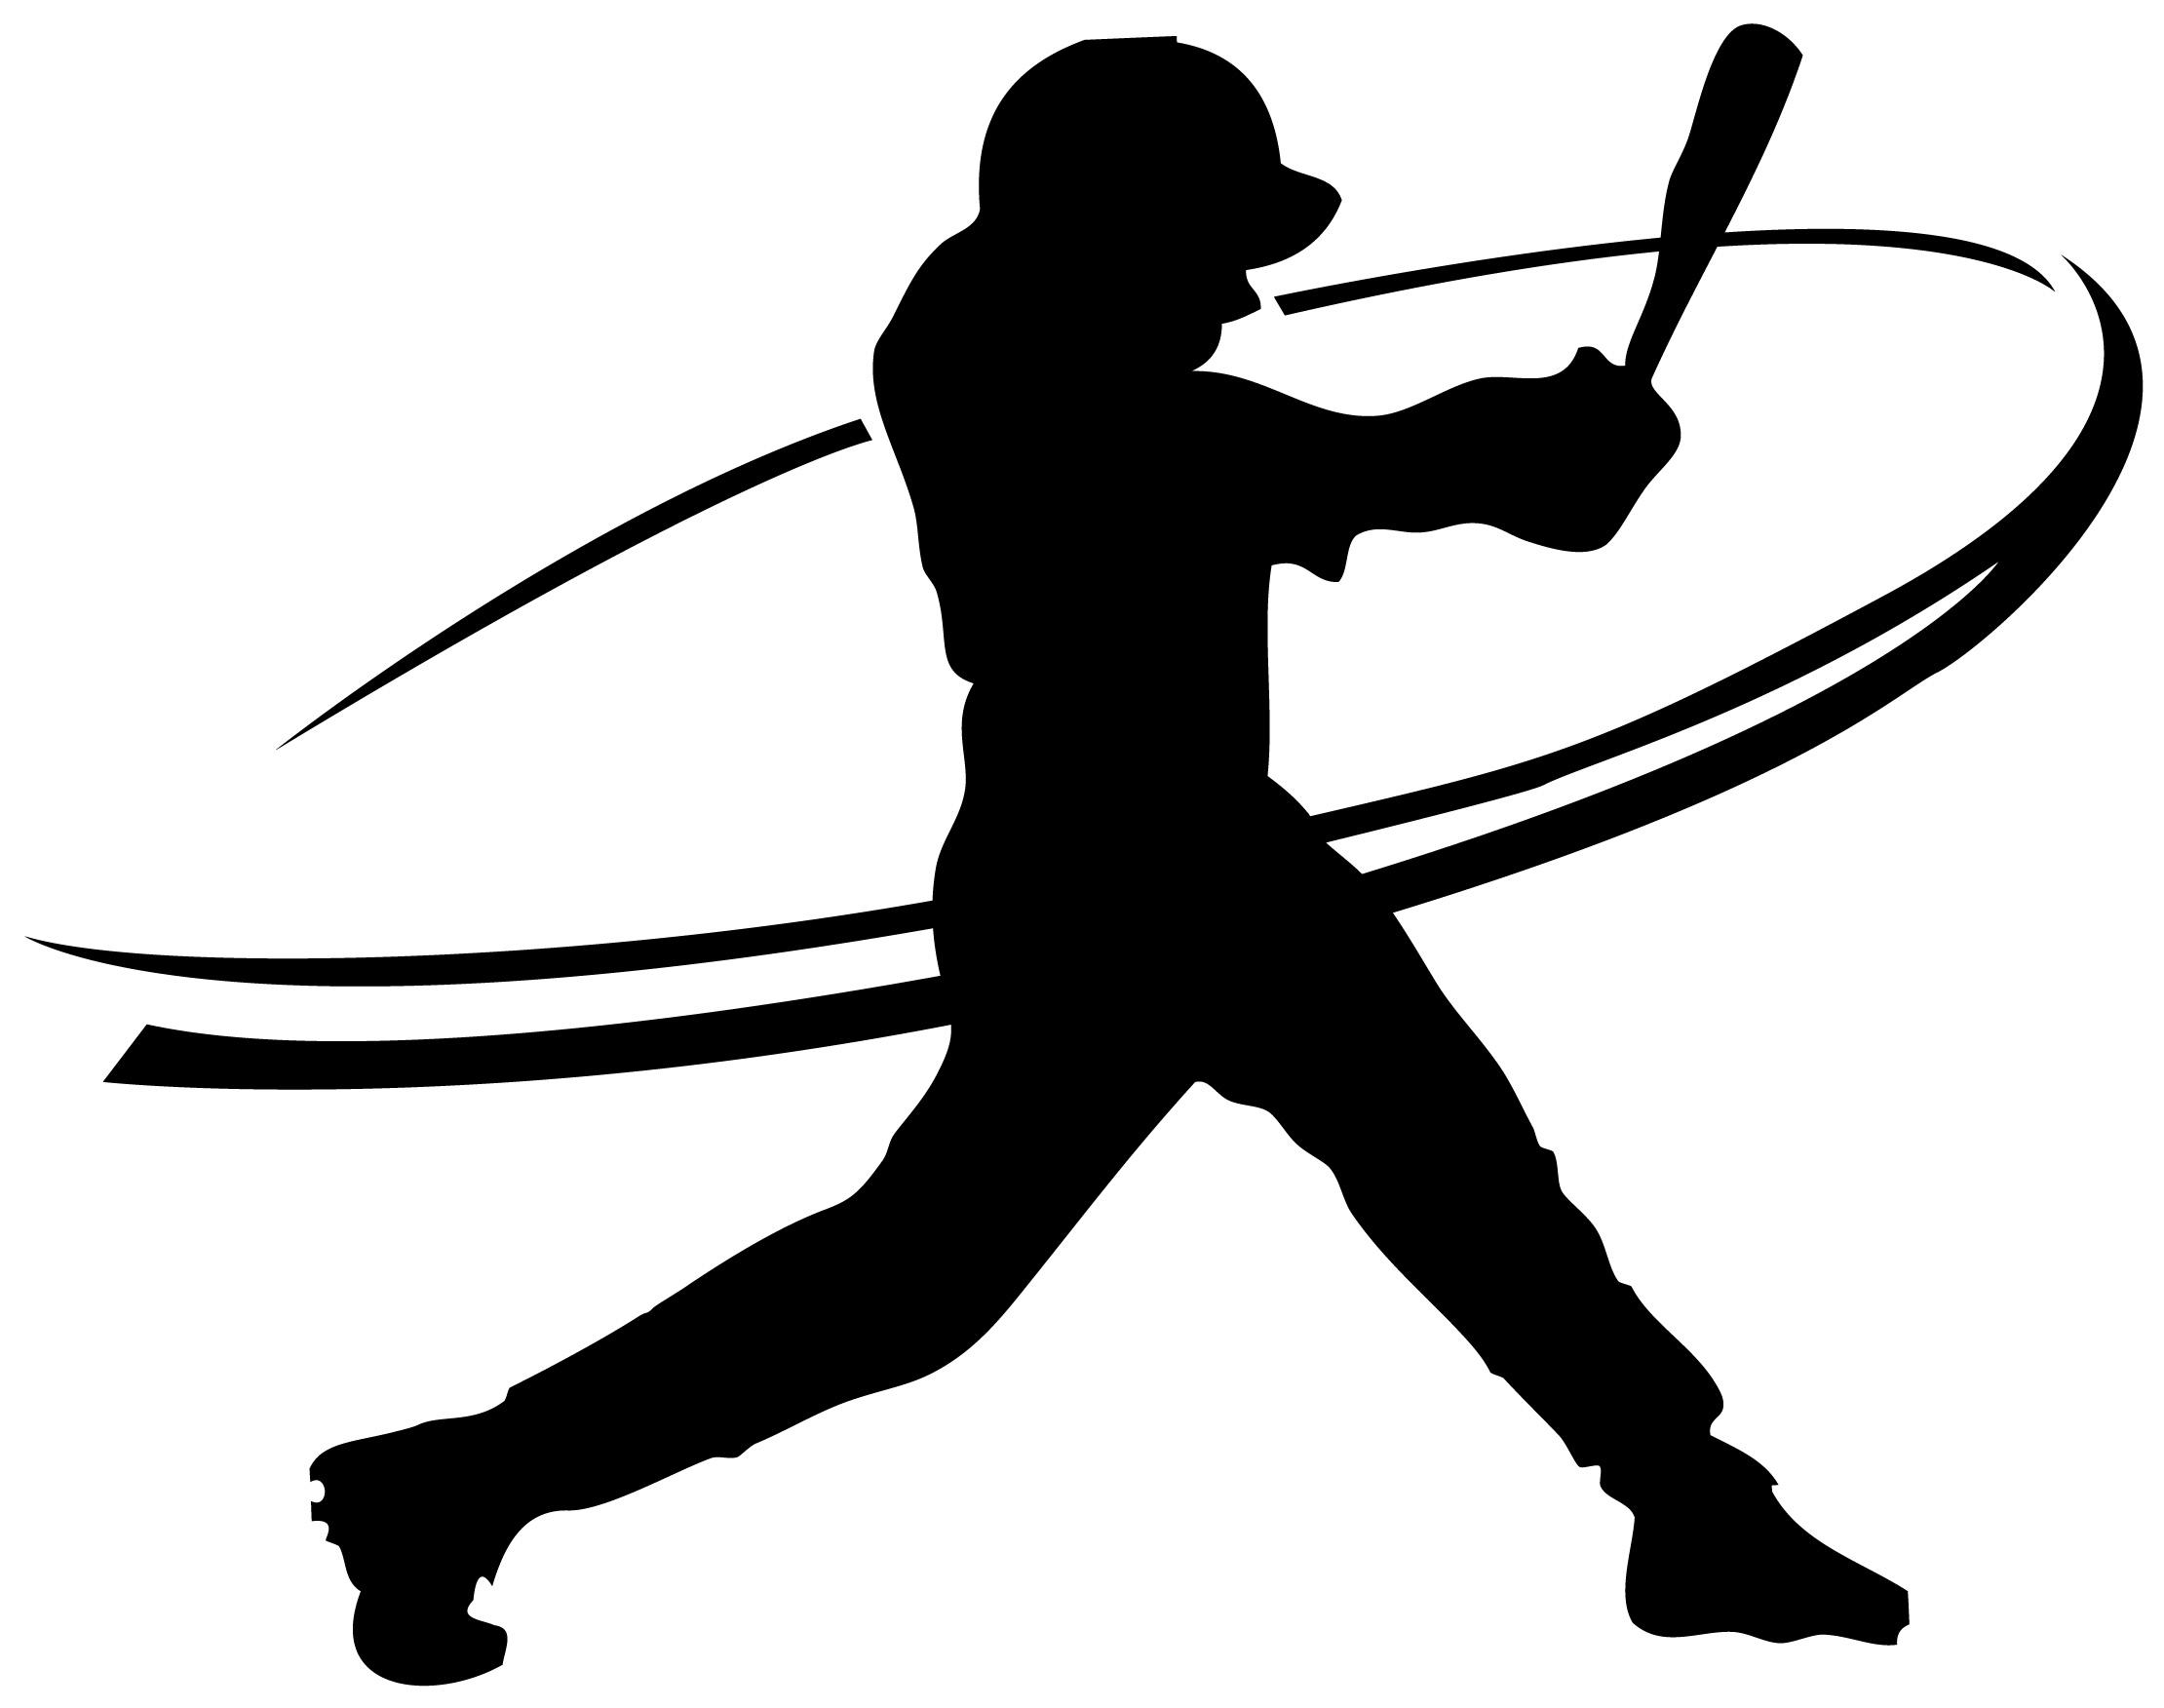 2220x1752 Clip Art Softball Bat And Ball Clipart